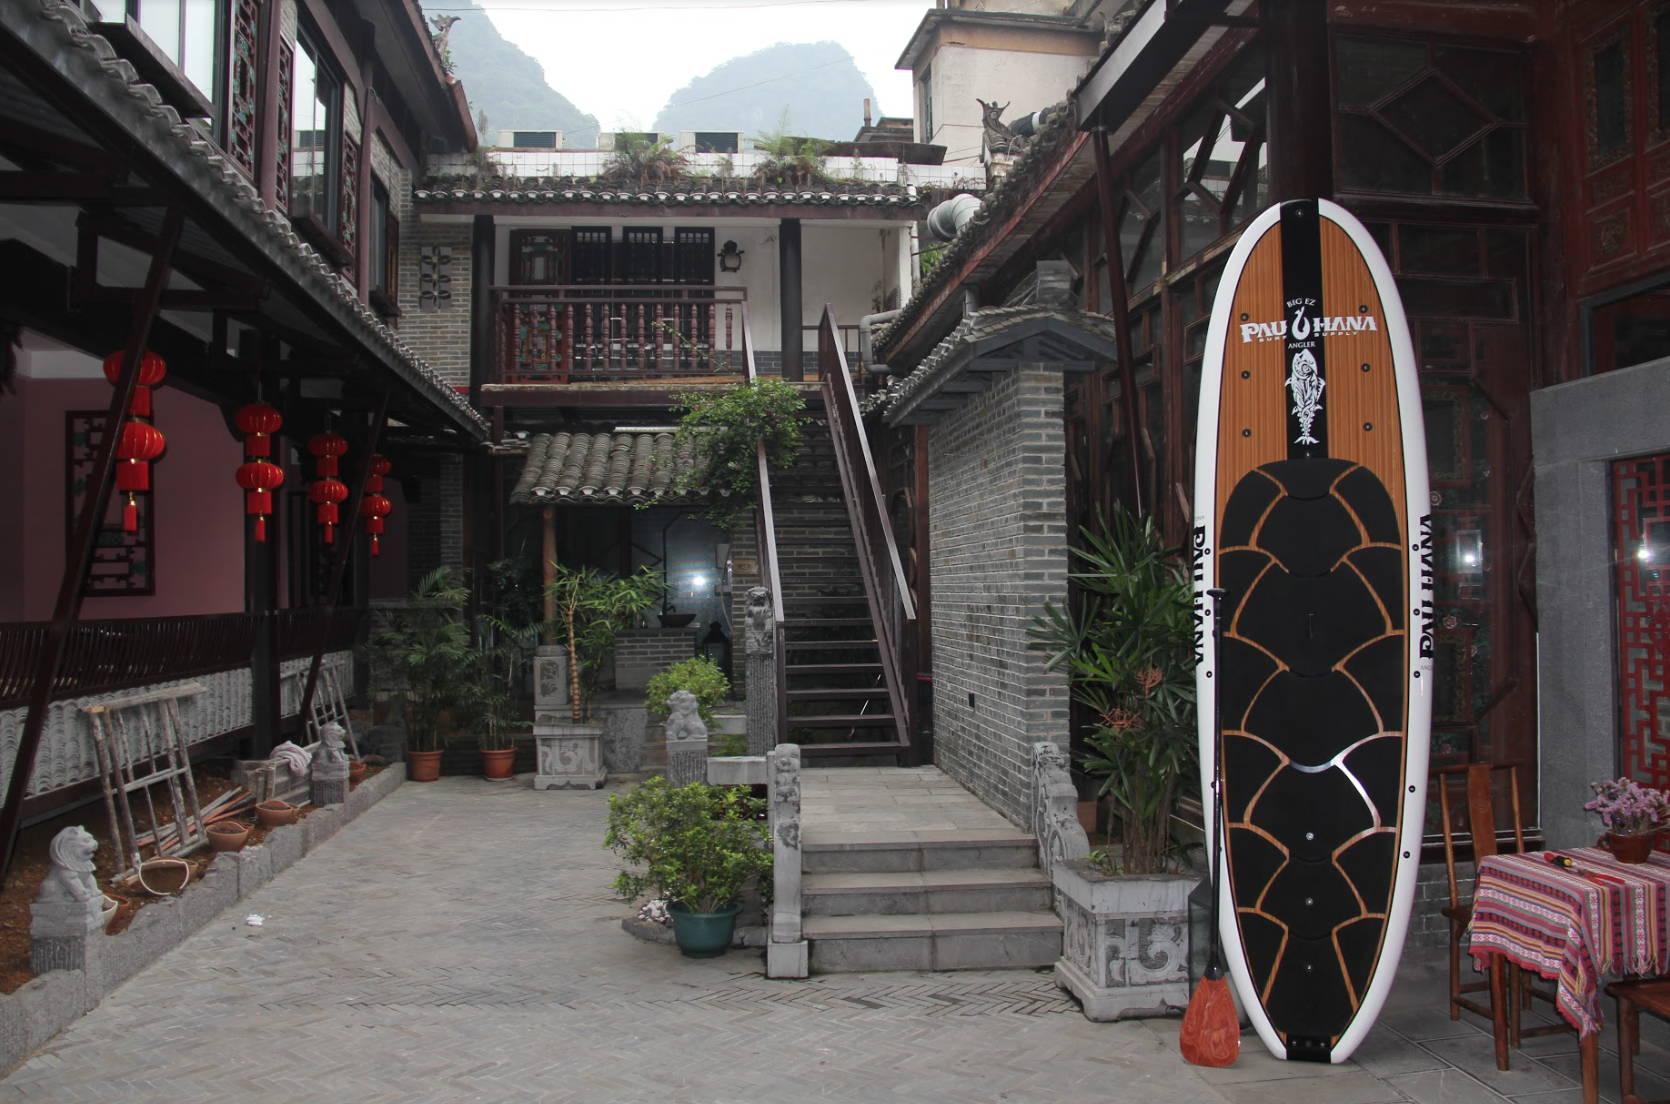 Big EZ angler board by Pau Hana surf supply in Shenzhen China